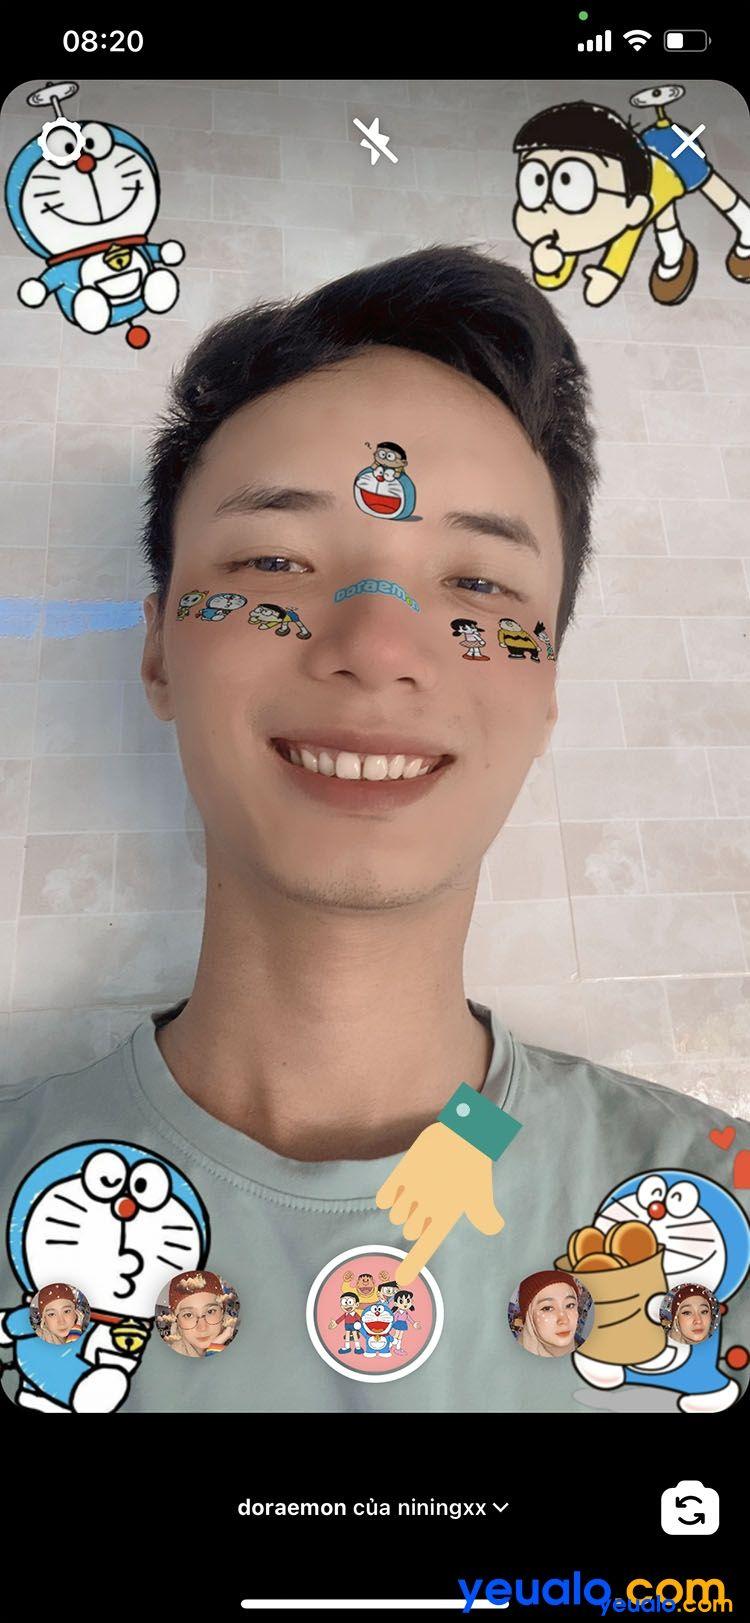 Cách lấy sticker Doraemon trên nền nhạc TikTok 8